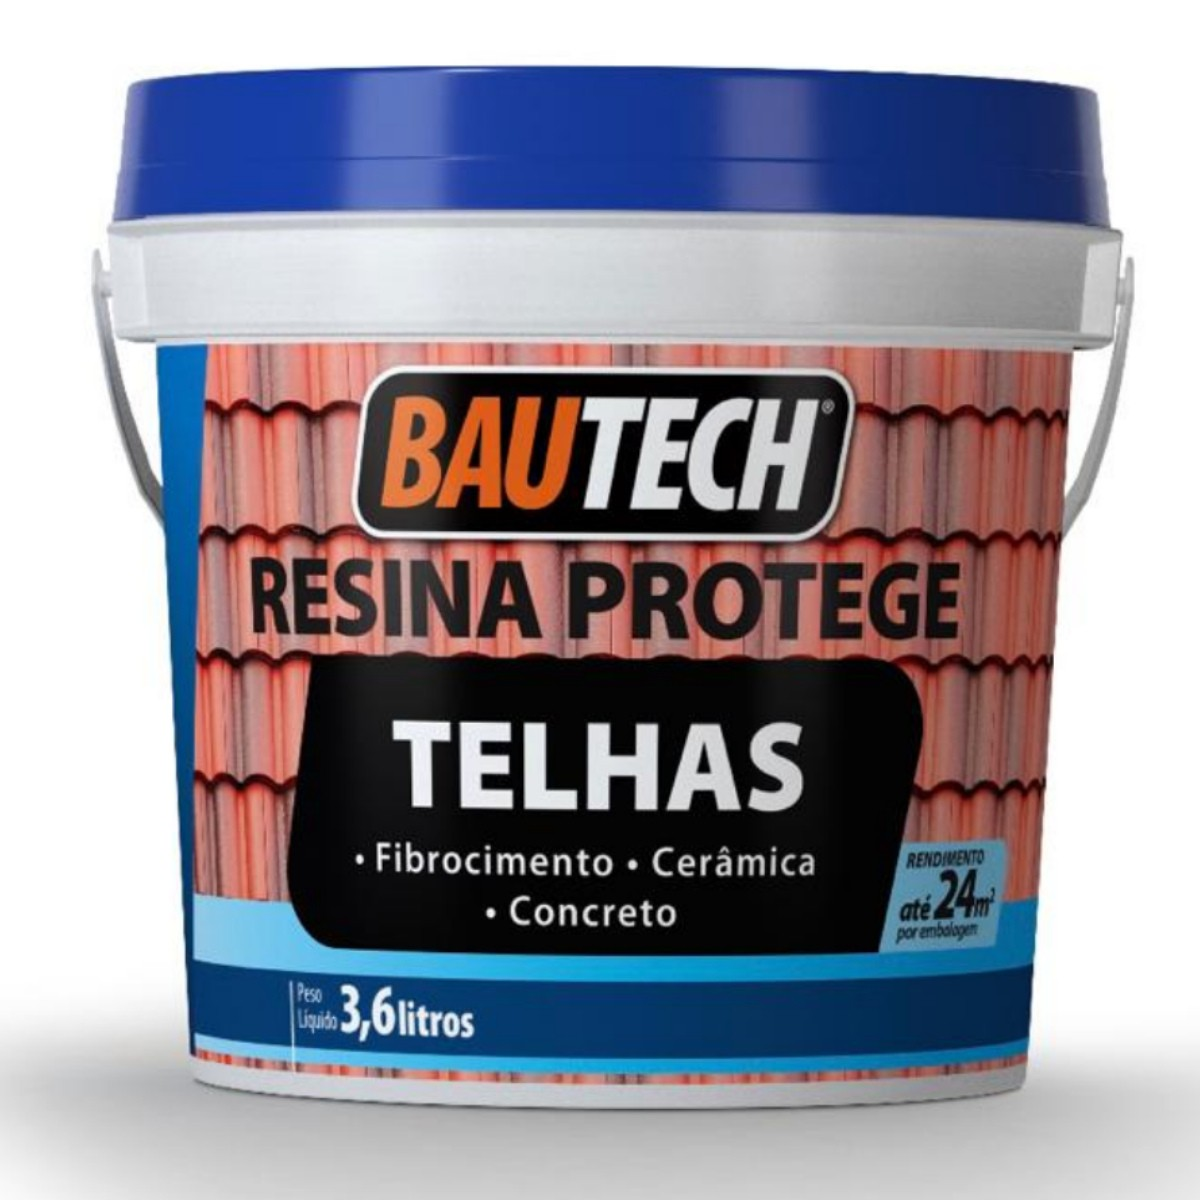 Resina Acrilica Protege Telhas Bautech 3,6L